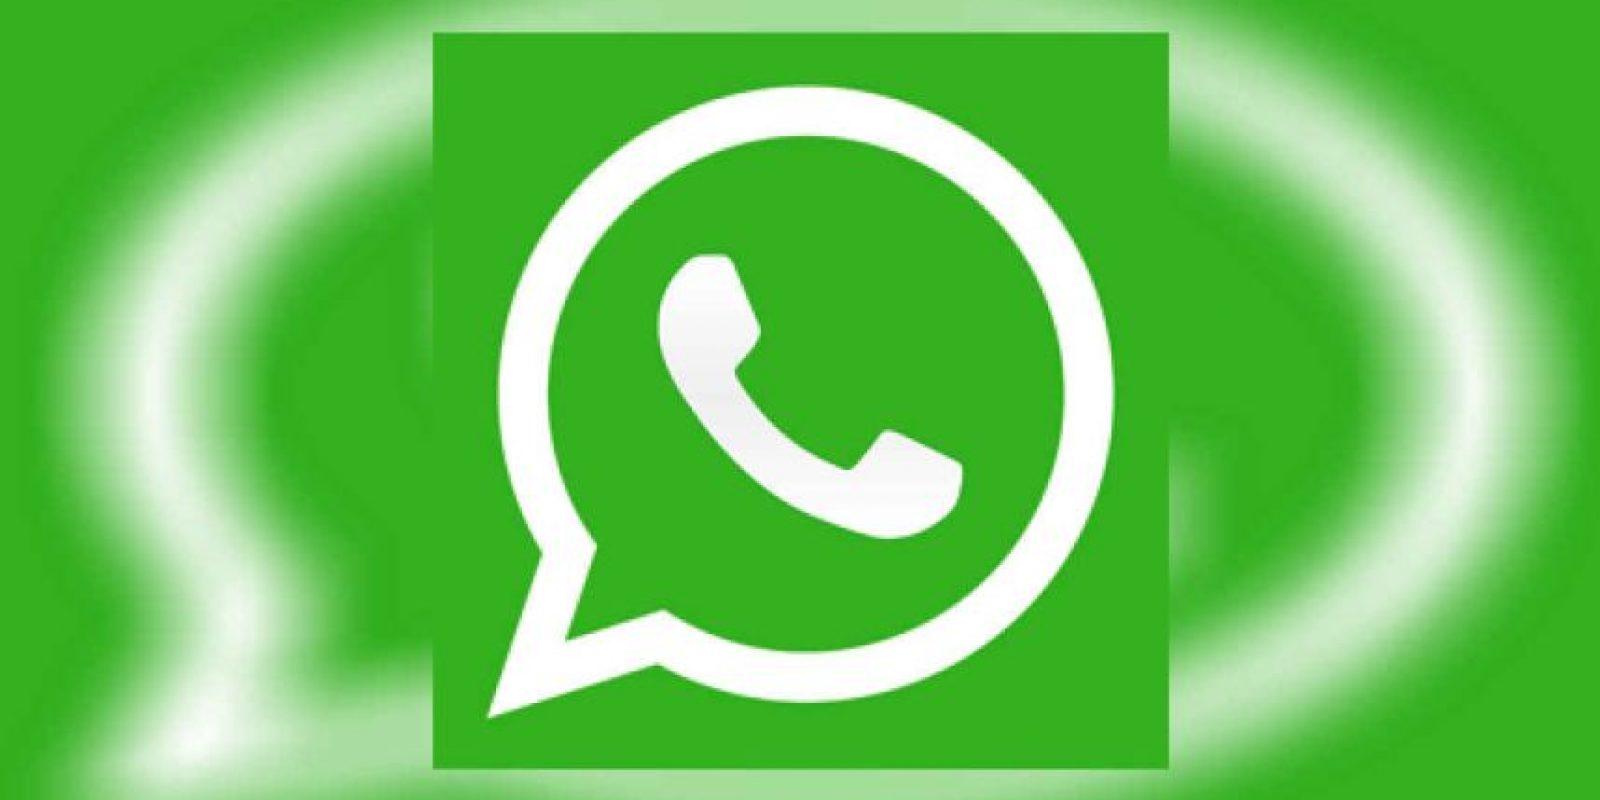 WhatsApp prepara muchas sorpresas para los usuarios. Foto:WhatsApp